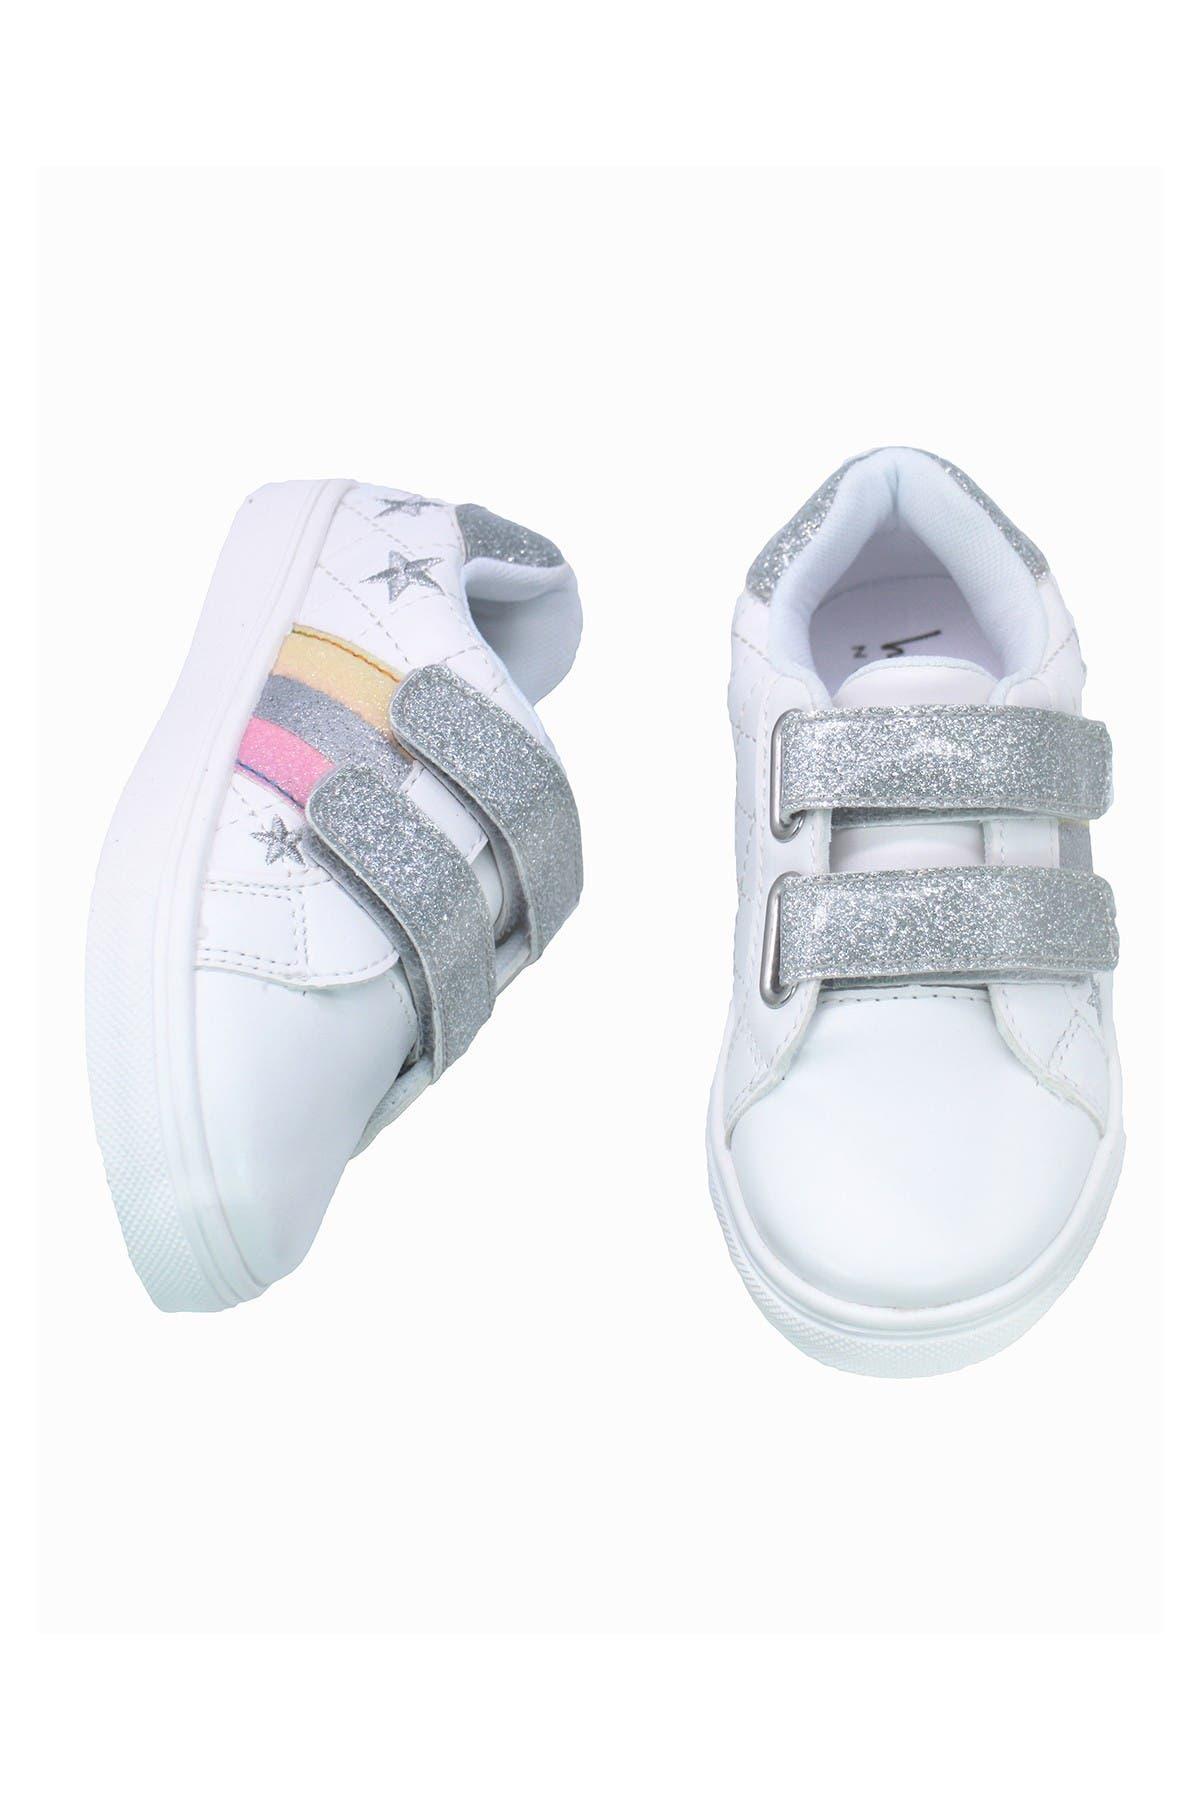 Image of Nicole Miller Glitter Sneaker